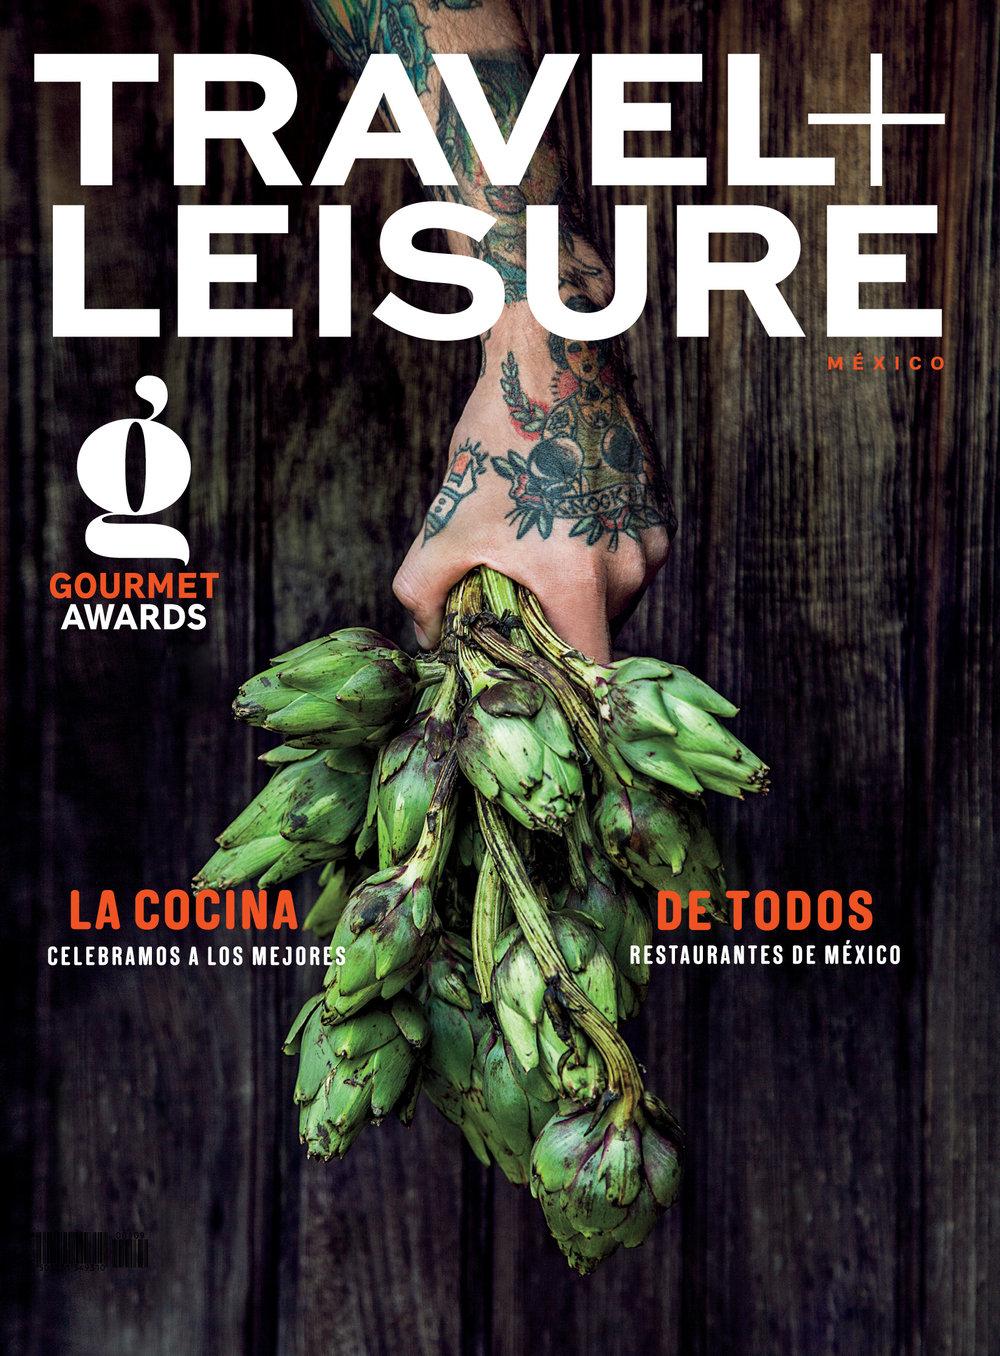 Travel+++Leisure+Mexico+Magazine_November+2017_Cover.JPG